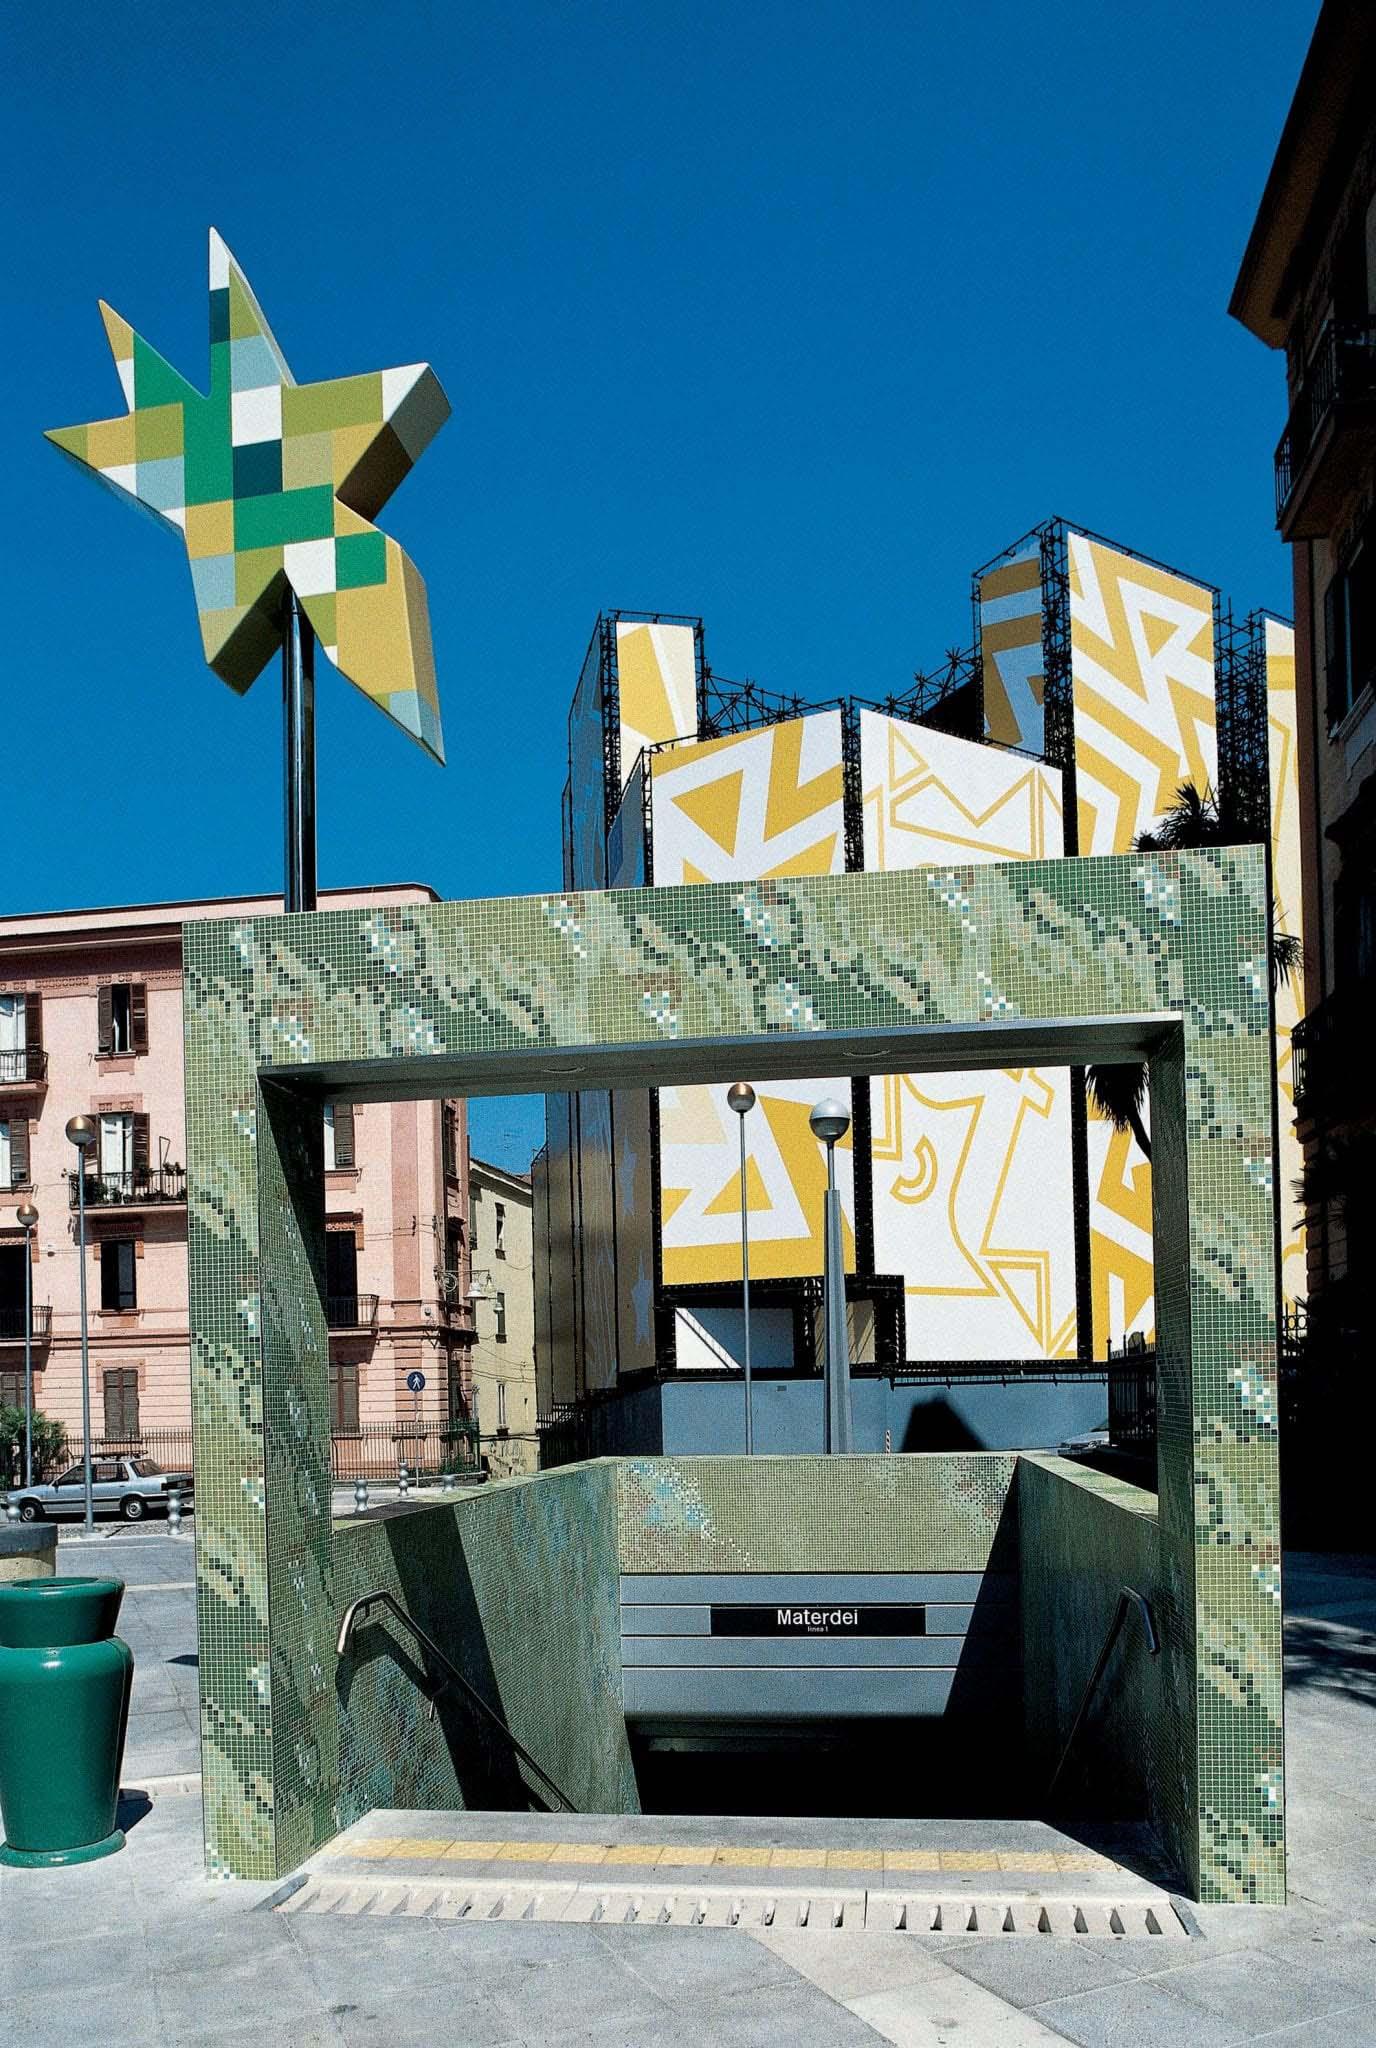 Metro Materdei in Naples Italy